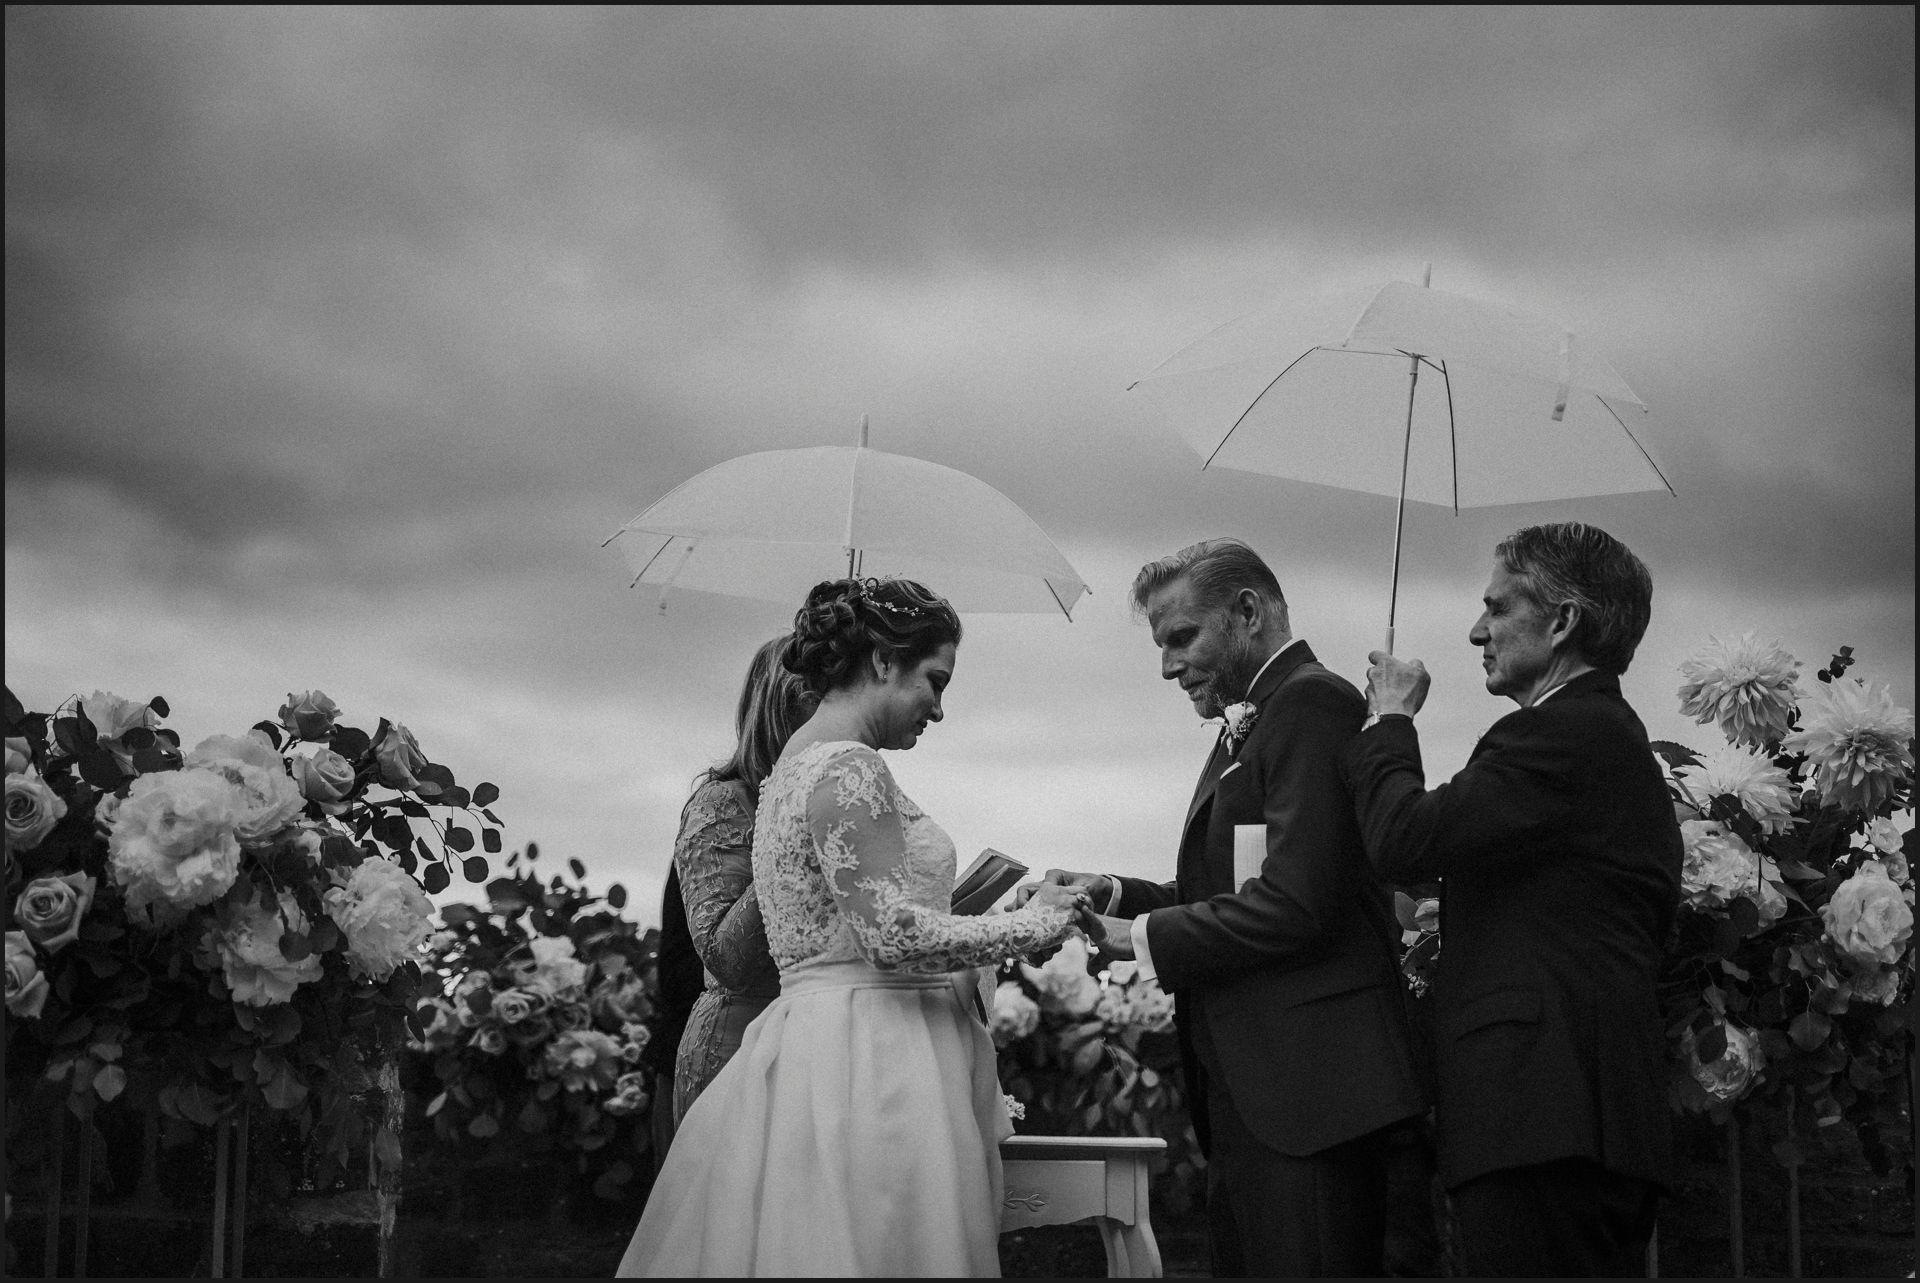 tuscany, destination wedding, chianti, wedding ceremony, bride, groom, rings, black and white